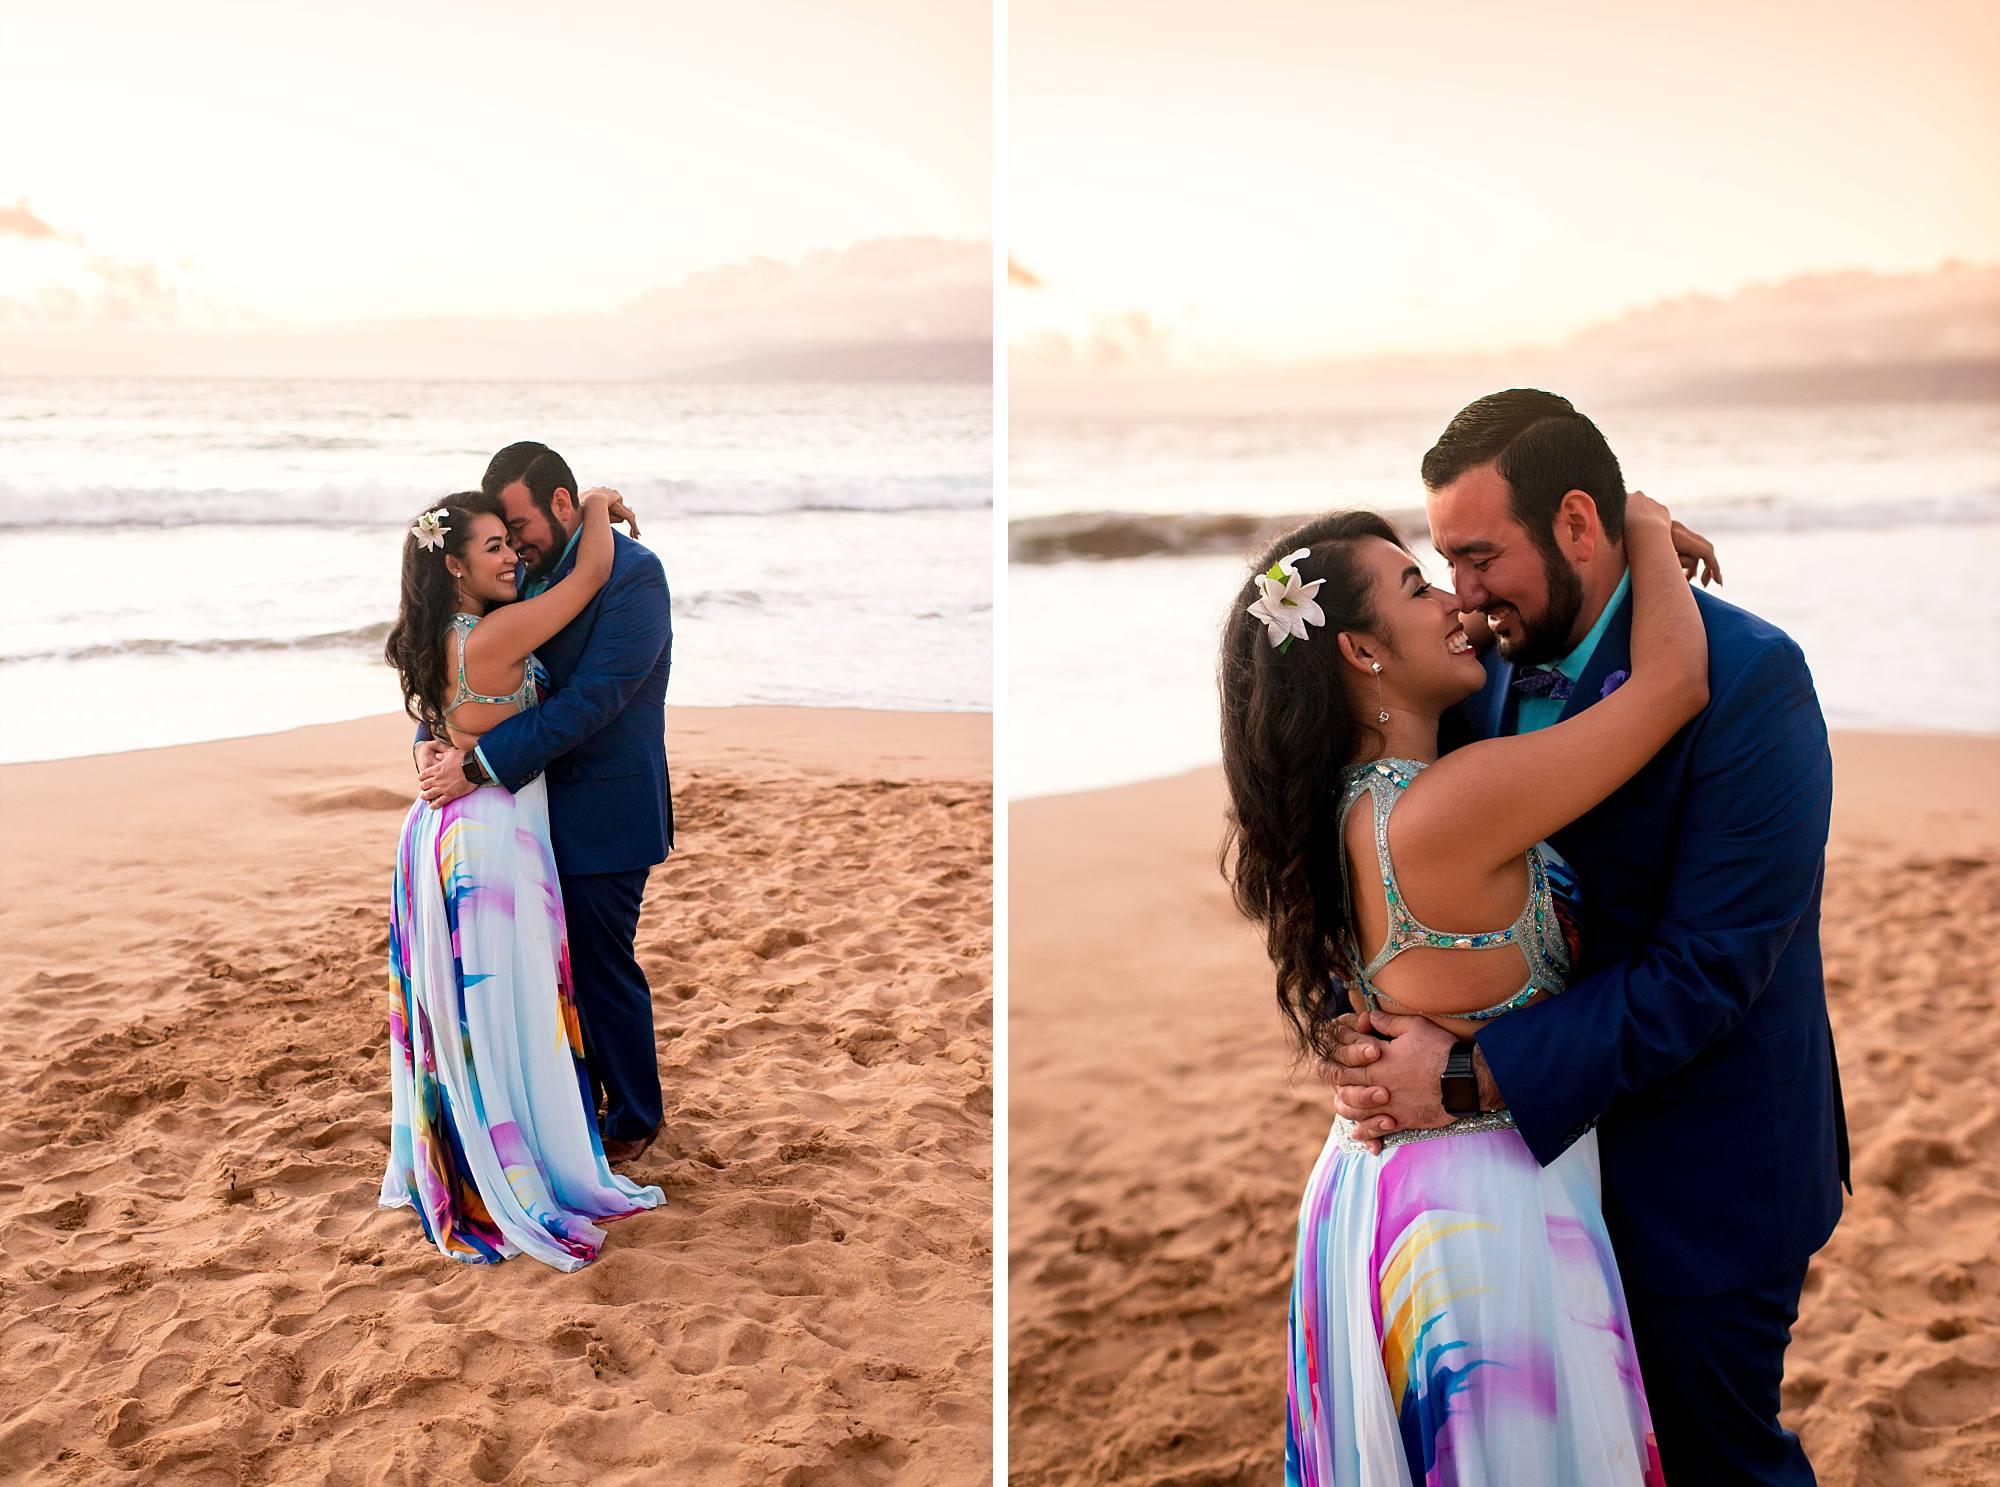 newly engaged couple cuddling on beach